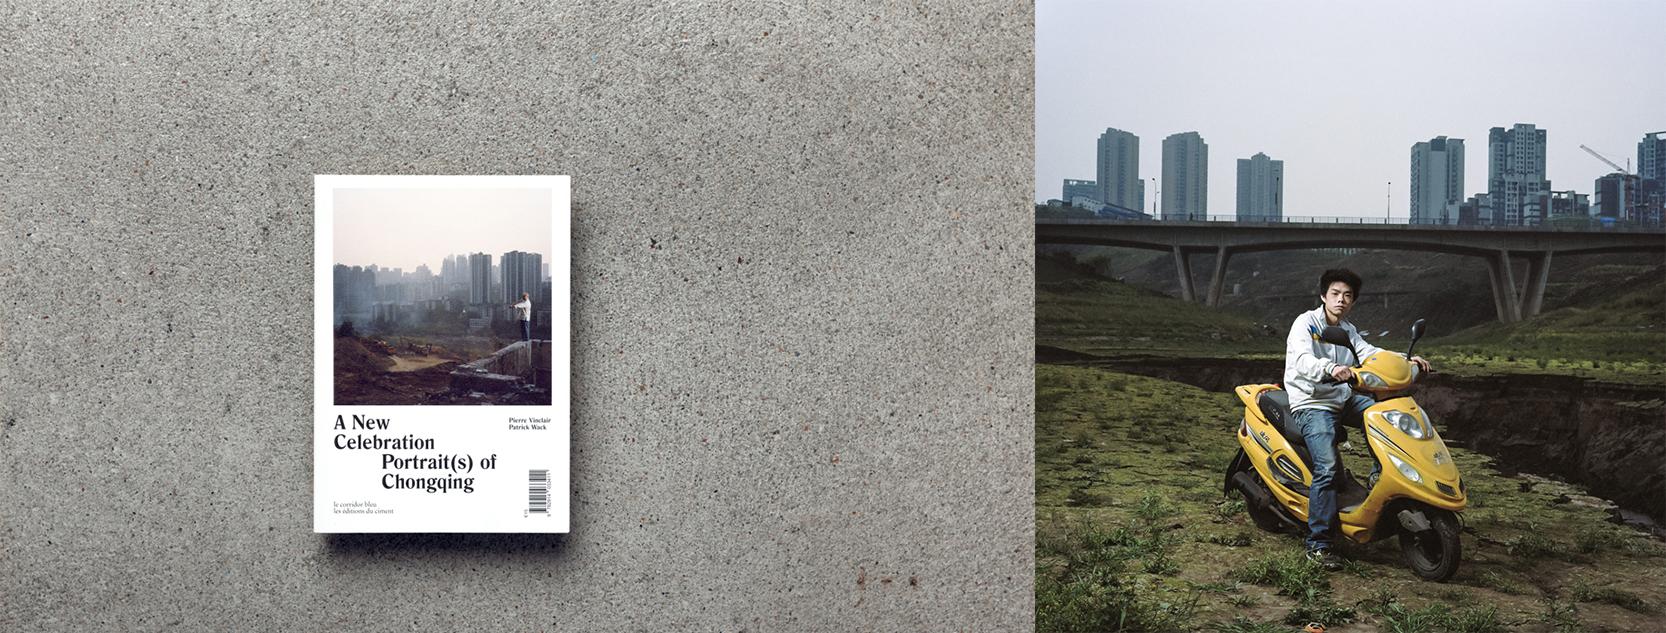 "Left: Patrick Wack's ""A New Celebration, Portrait(s) of Chongqing"" monograph publish in 2014 Right: Chongqing 02,  2013 ©Patrick Wack"